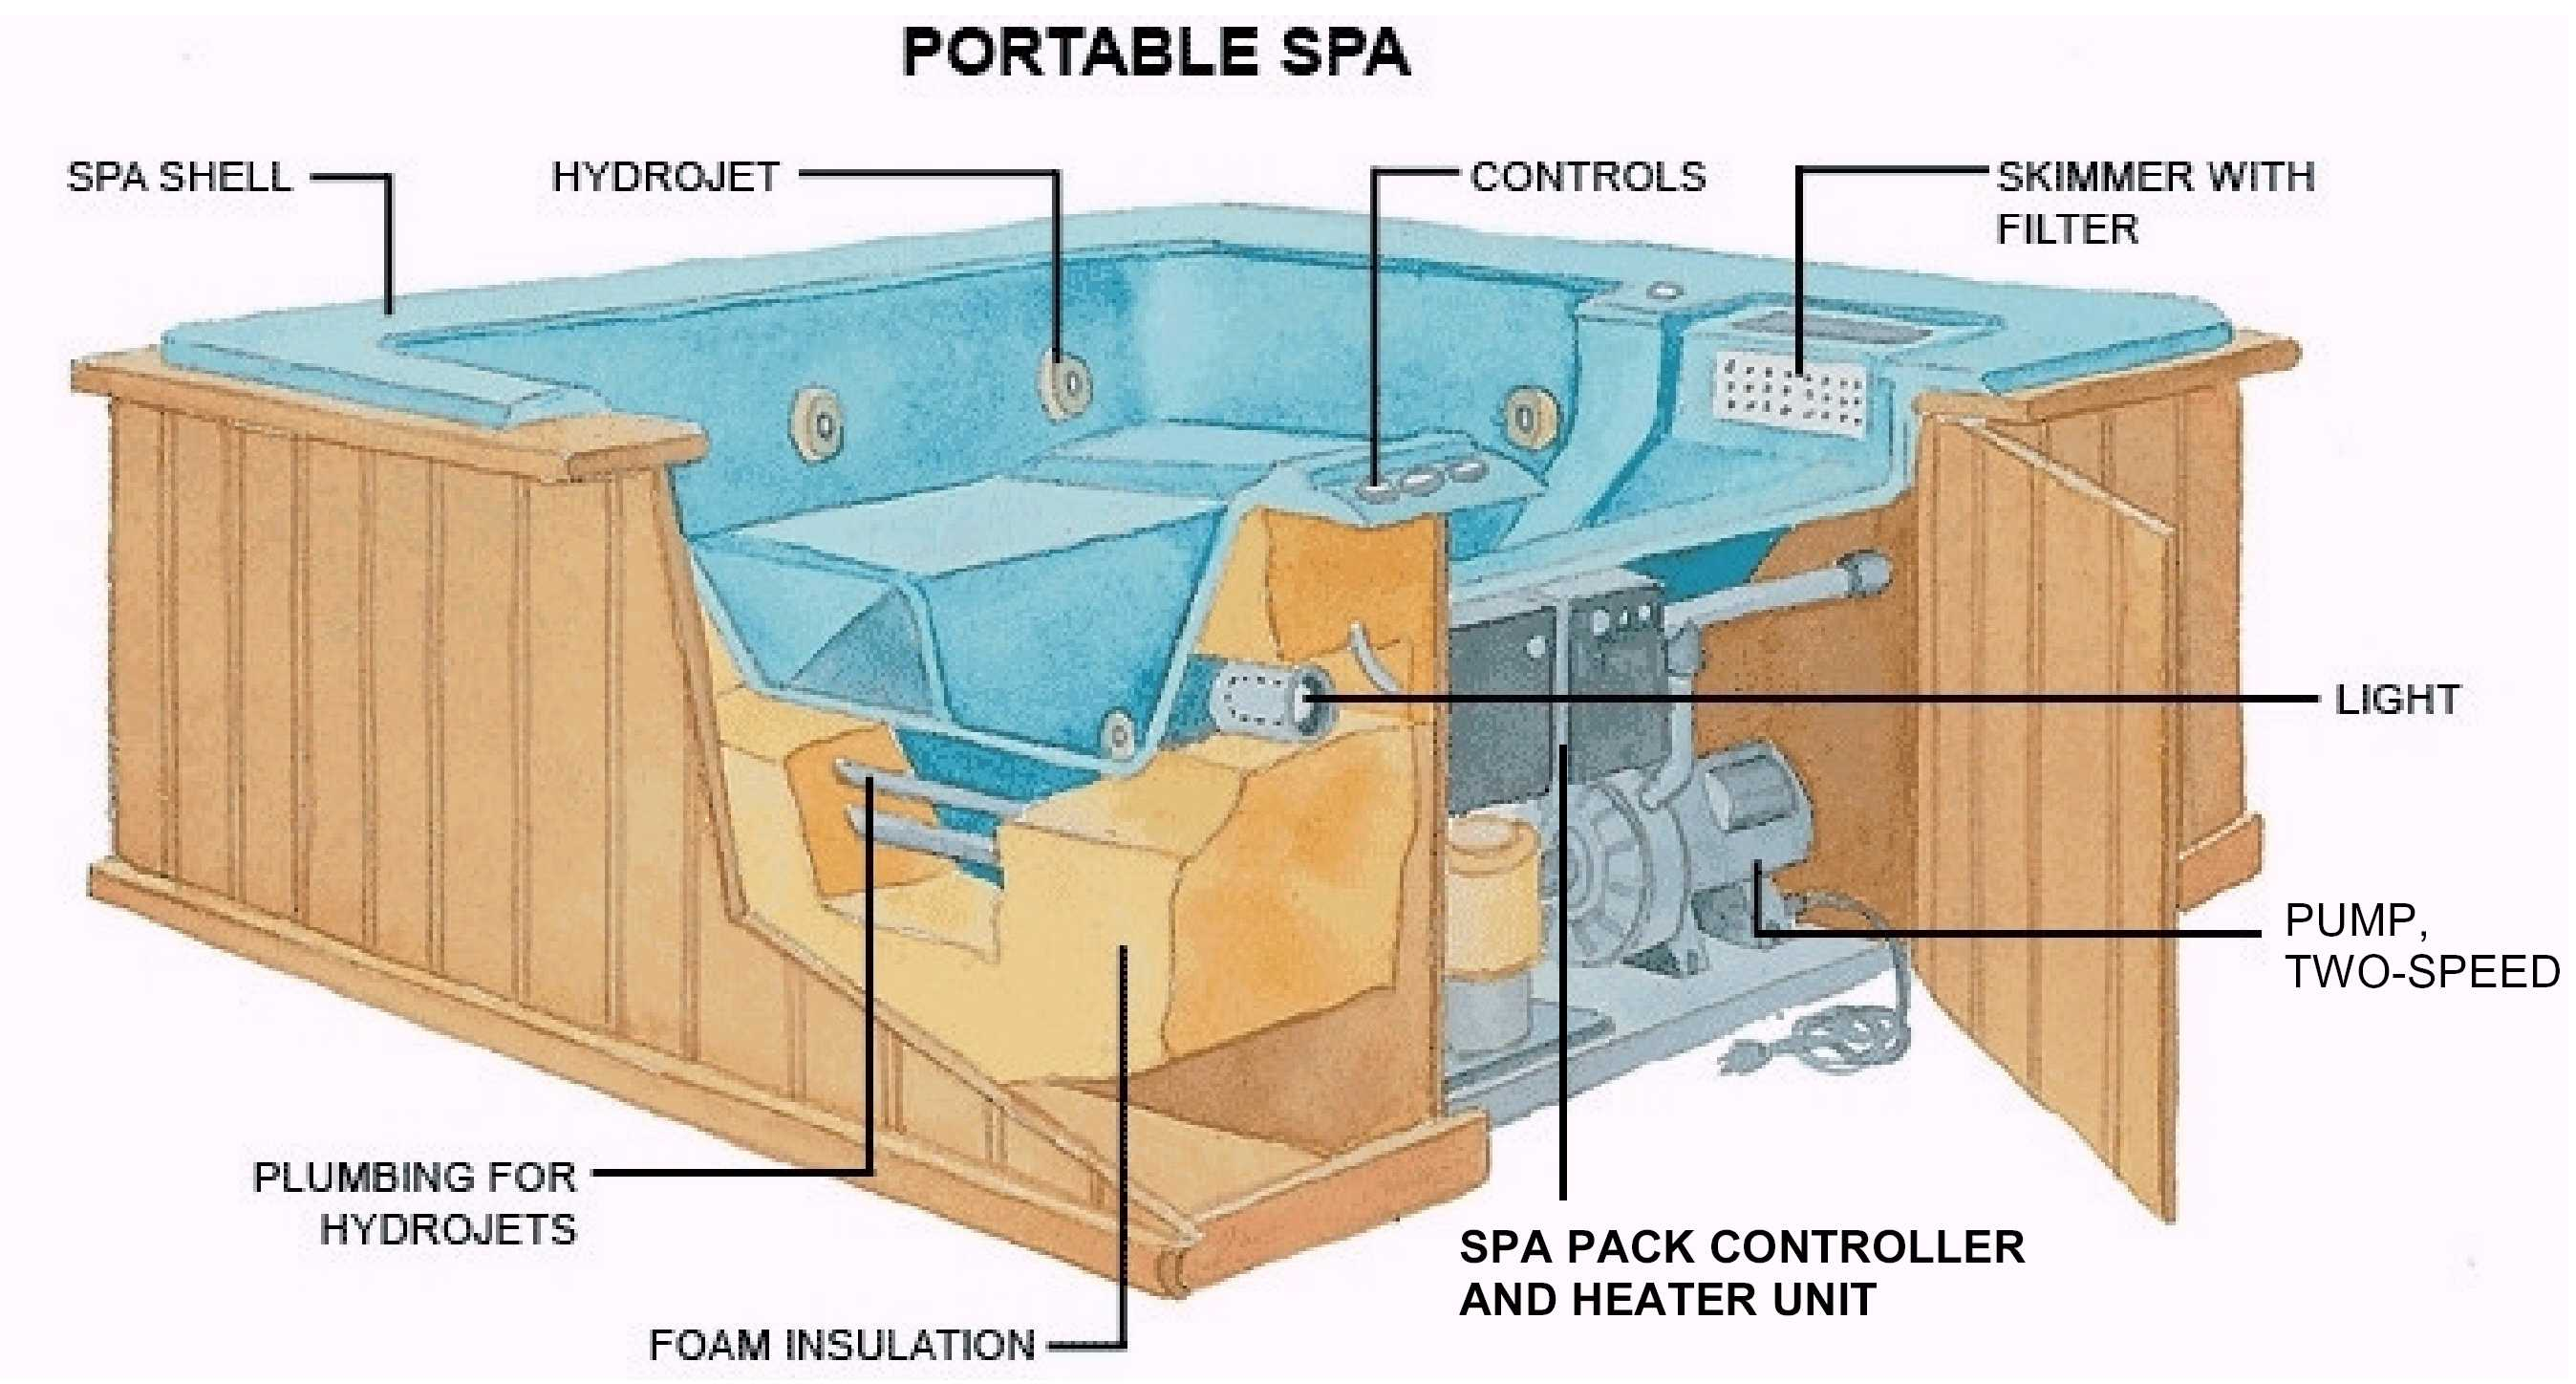 bermuda spa wiring diagram vc 9417  hot springs hot tub wiring diagram schematic wiring  hot springs hot tub wiring diagram